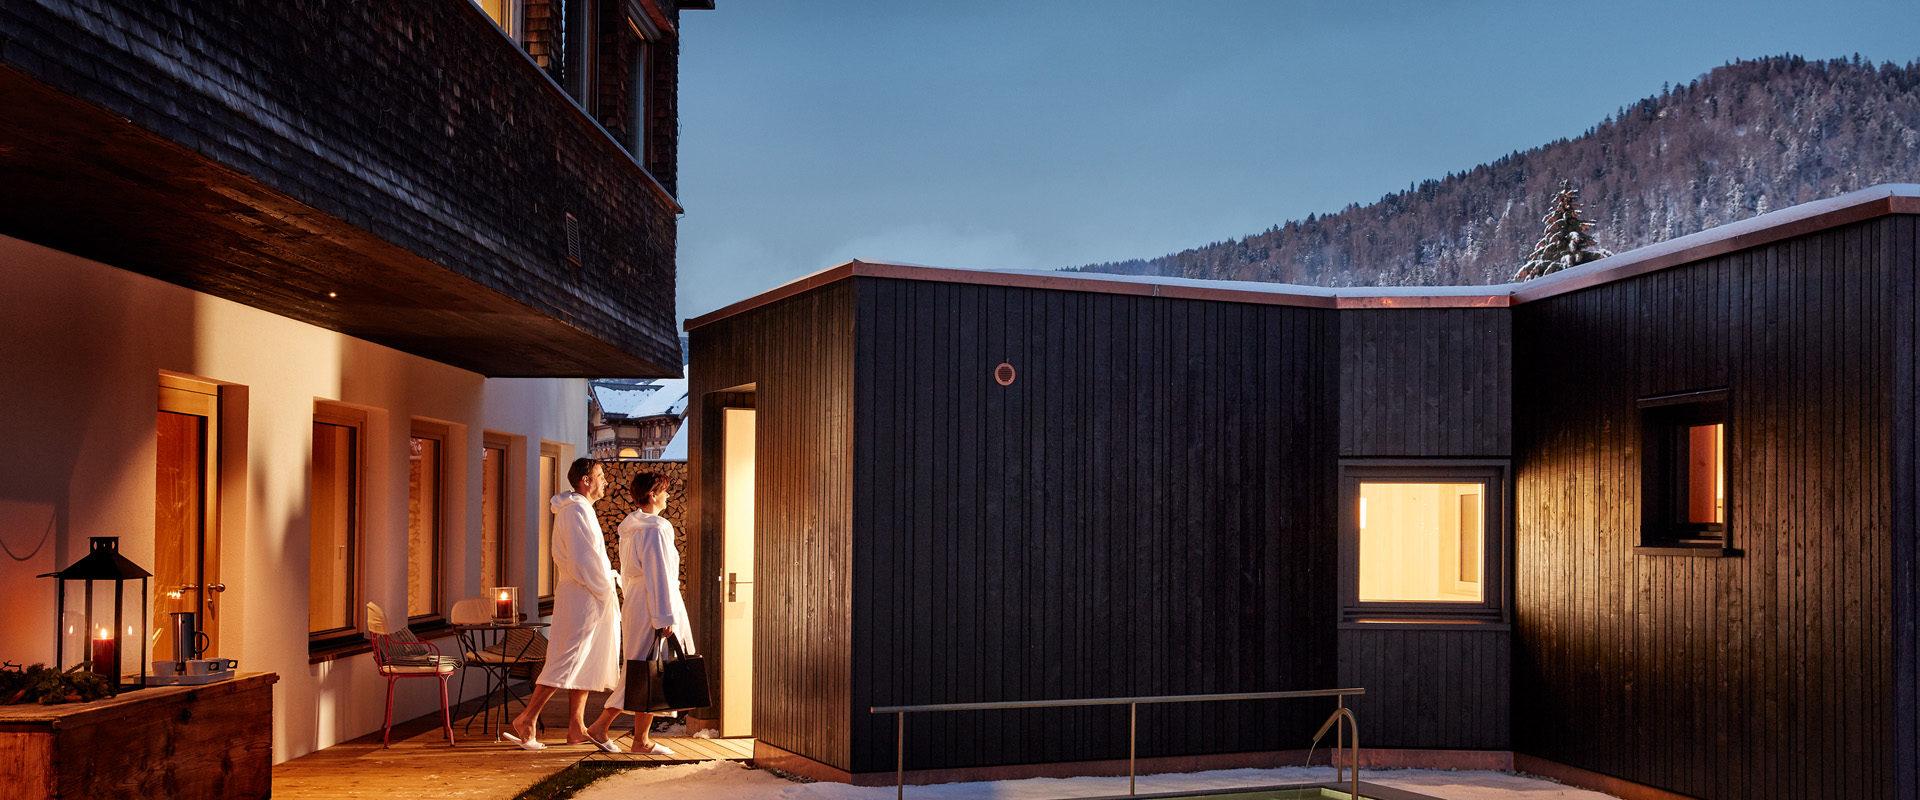 Sinful saunas